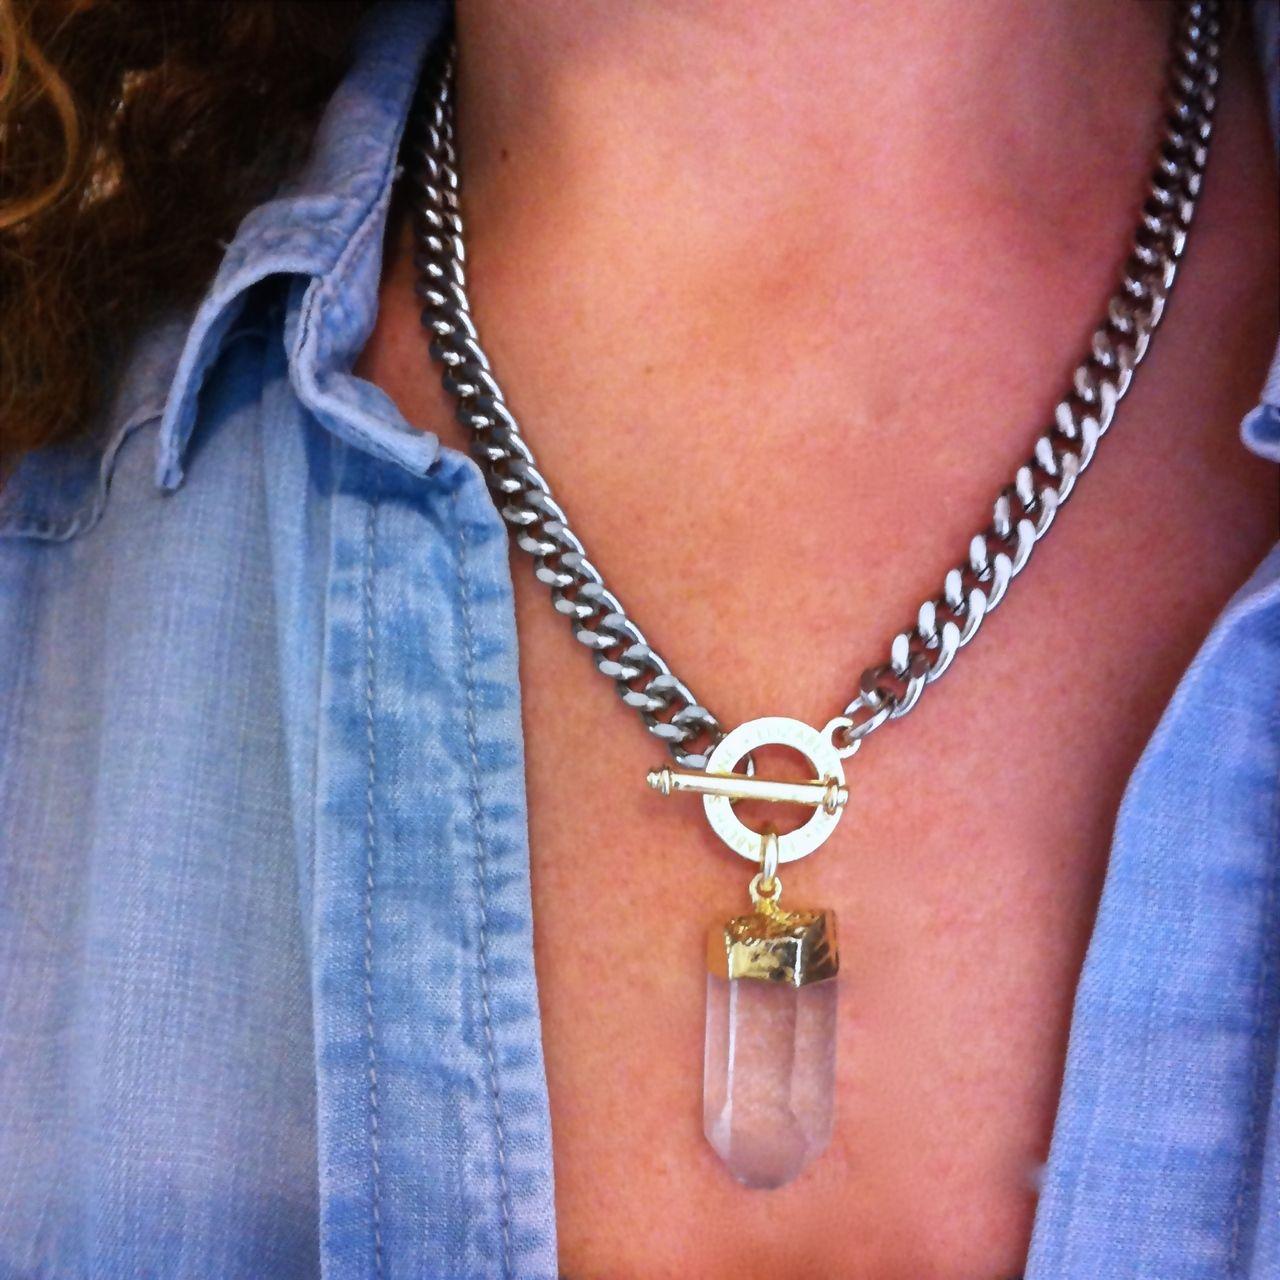 Elizabeth Stone Jewelry - Glam Rock Crystal Necklace, $58.00 (http://www.elizabethstonejewelry.com/glam-rock-crystal-necklace/)